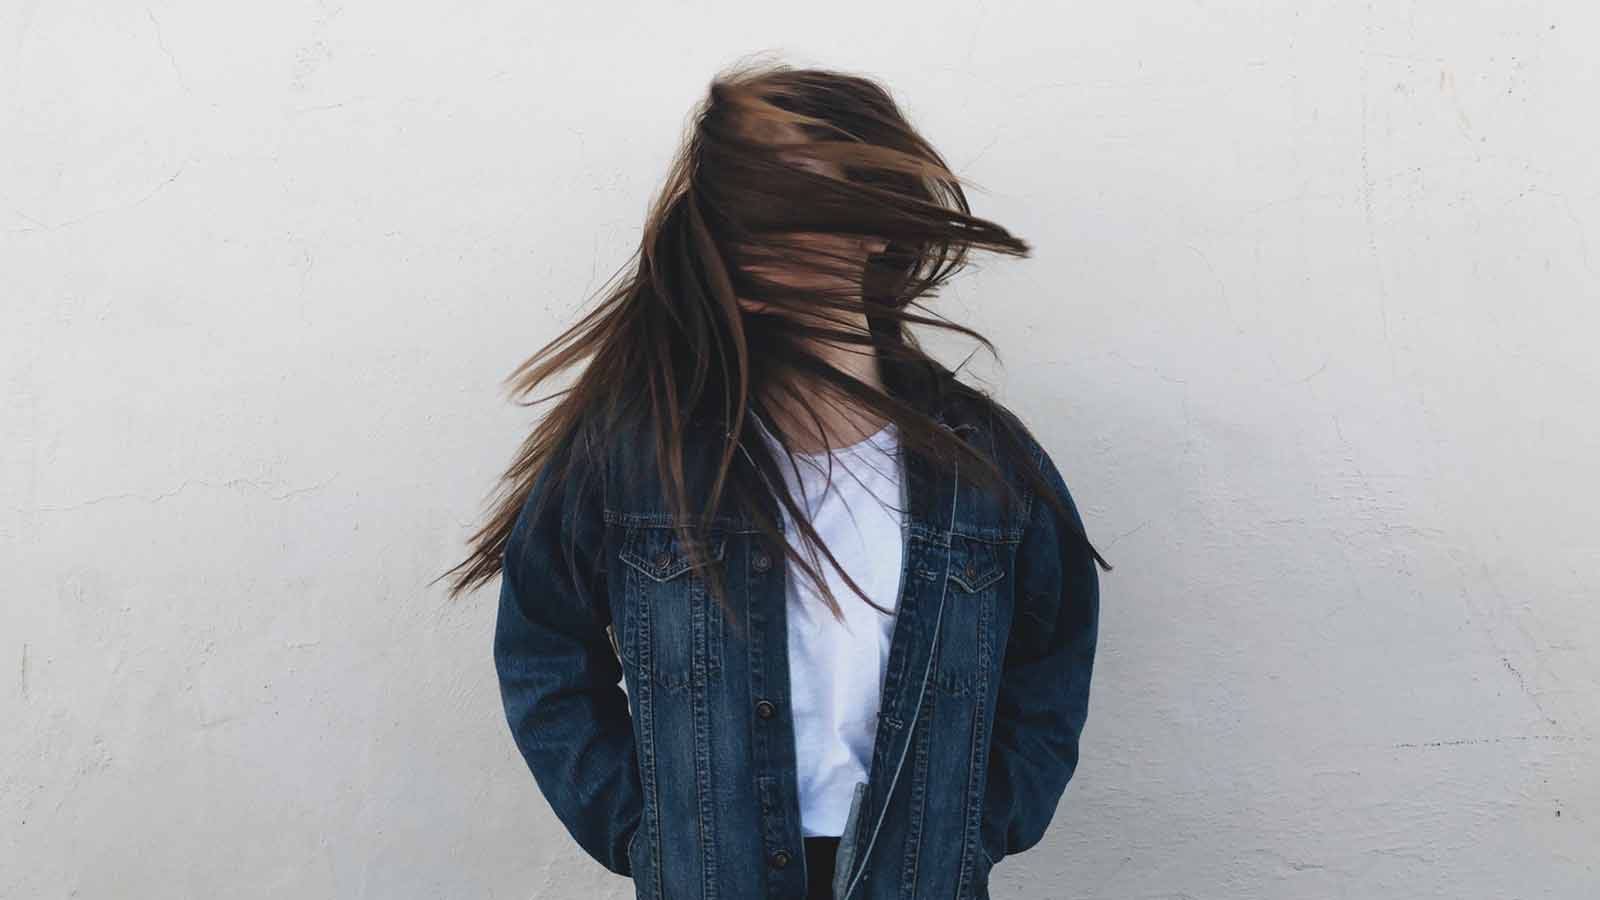 woman shaking her hair